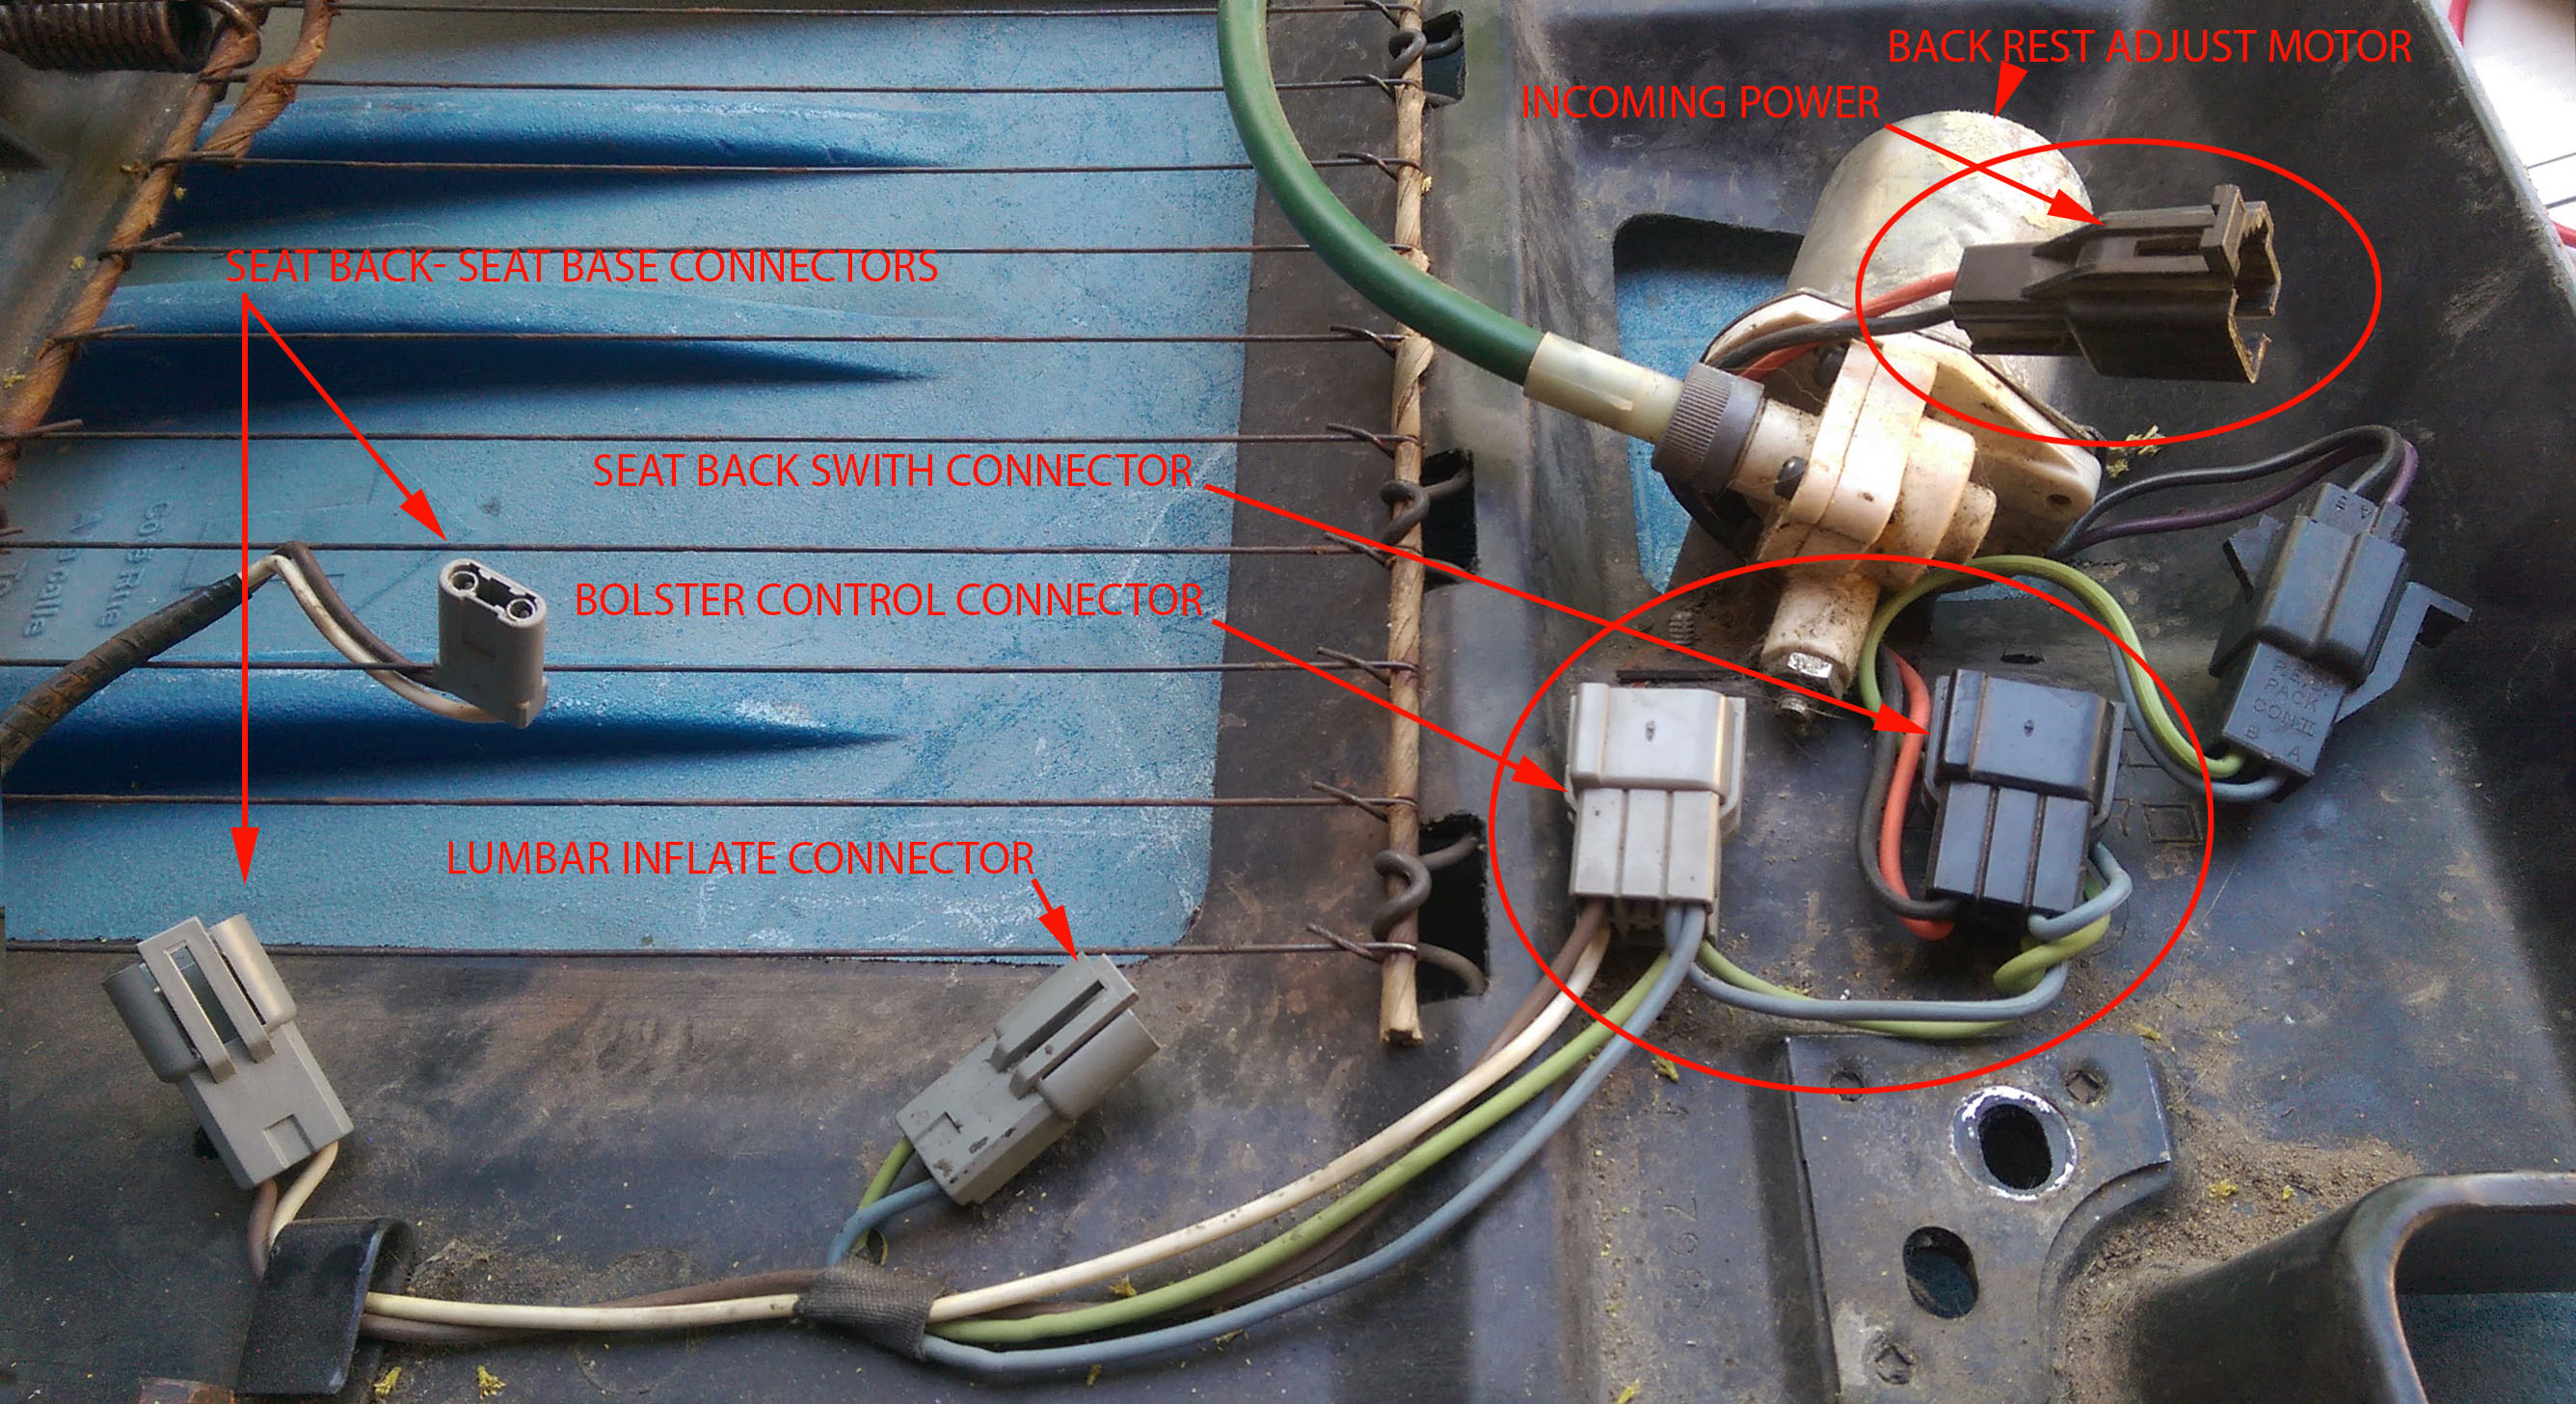 1984 C4 Corvette Wiring Diagram Help Diagram – Lt1 Engine Wiring Diagram Ecm 1984